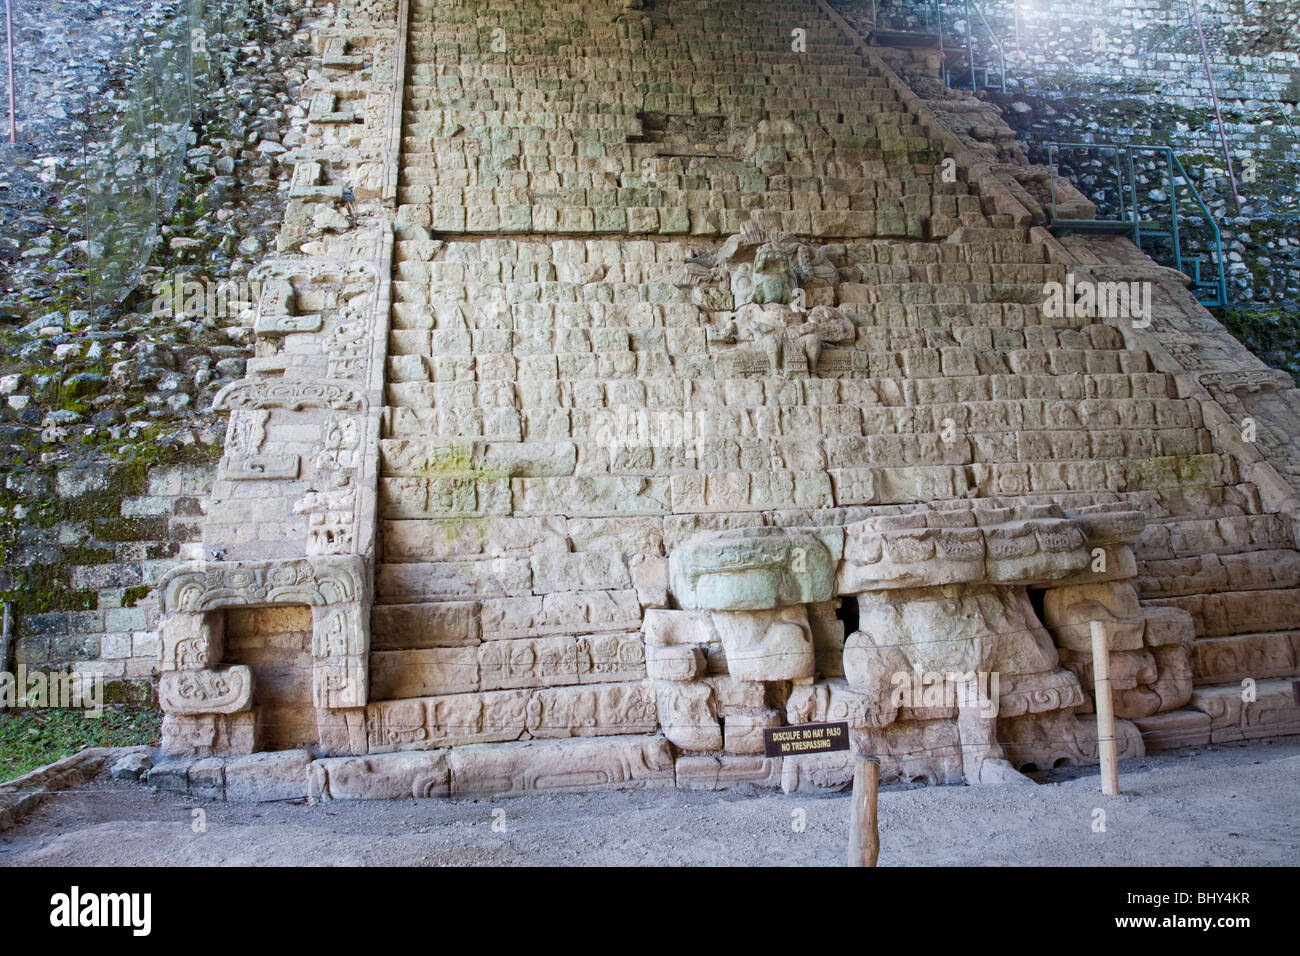 Escalinata Jeroglifica, Hieroglyphic Stairway, Copan Ruinas, Honduras - Stock Image